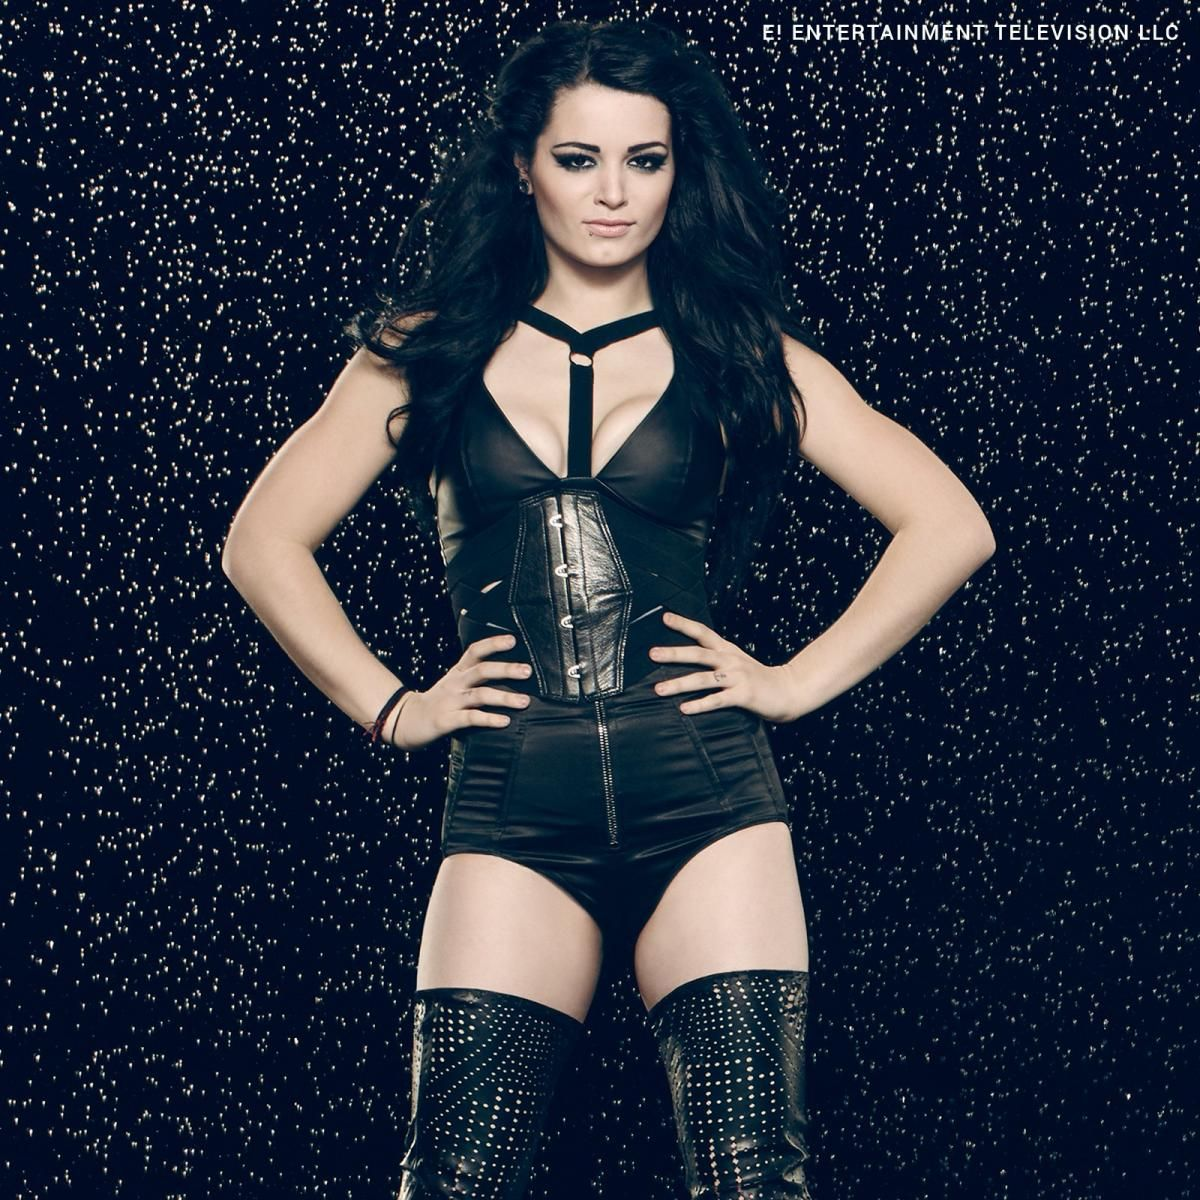 Photos Celebrating 100 Episodes Of Total Divas Paige Wwe Wwe Divas Paige Wwe Girls